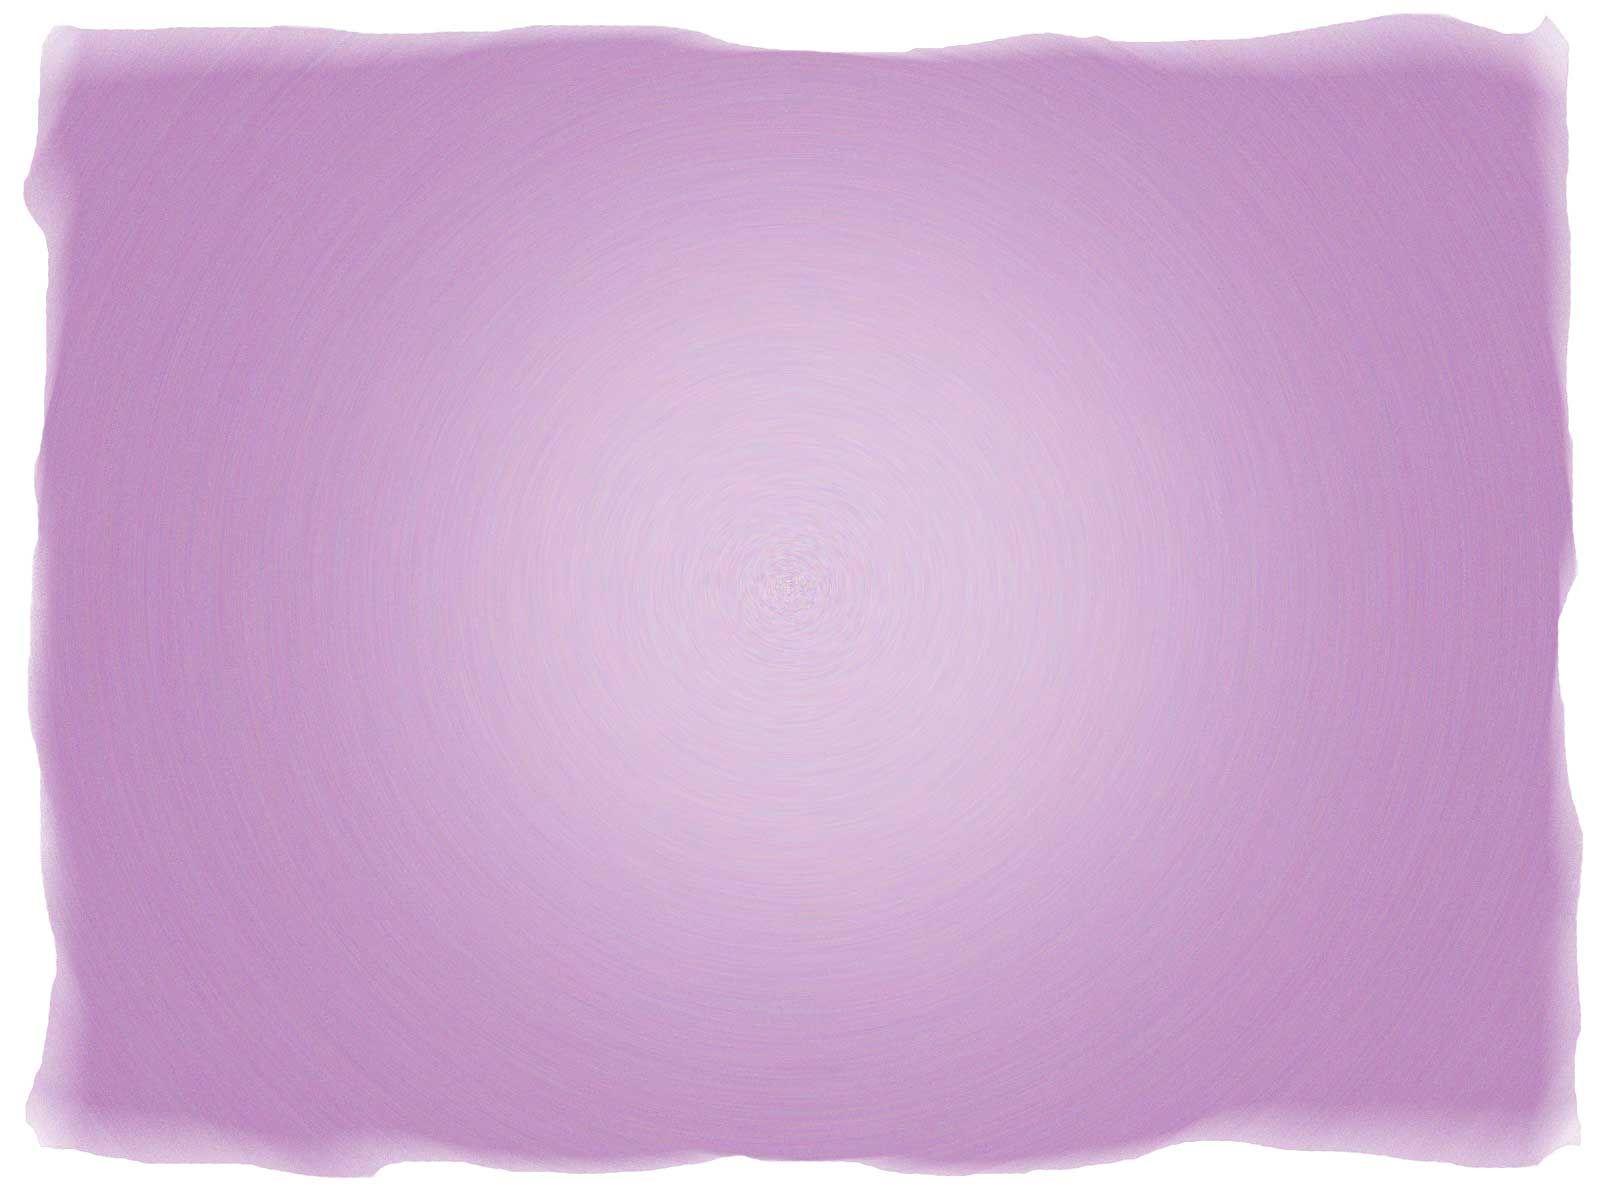 Pink Plain Light Color Background Wallpaper 5161